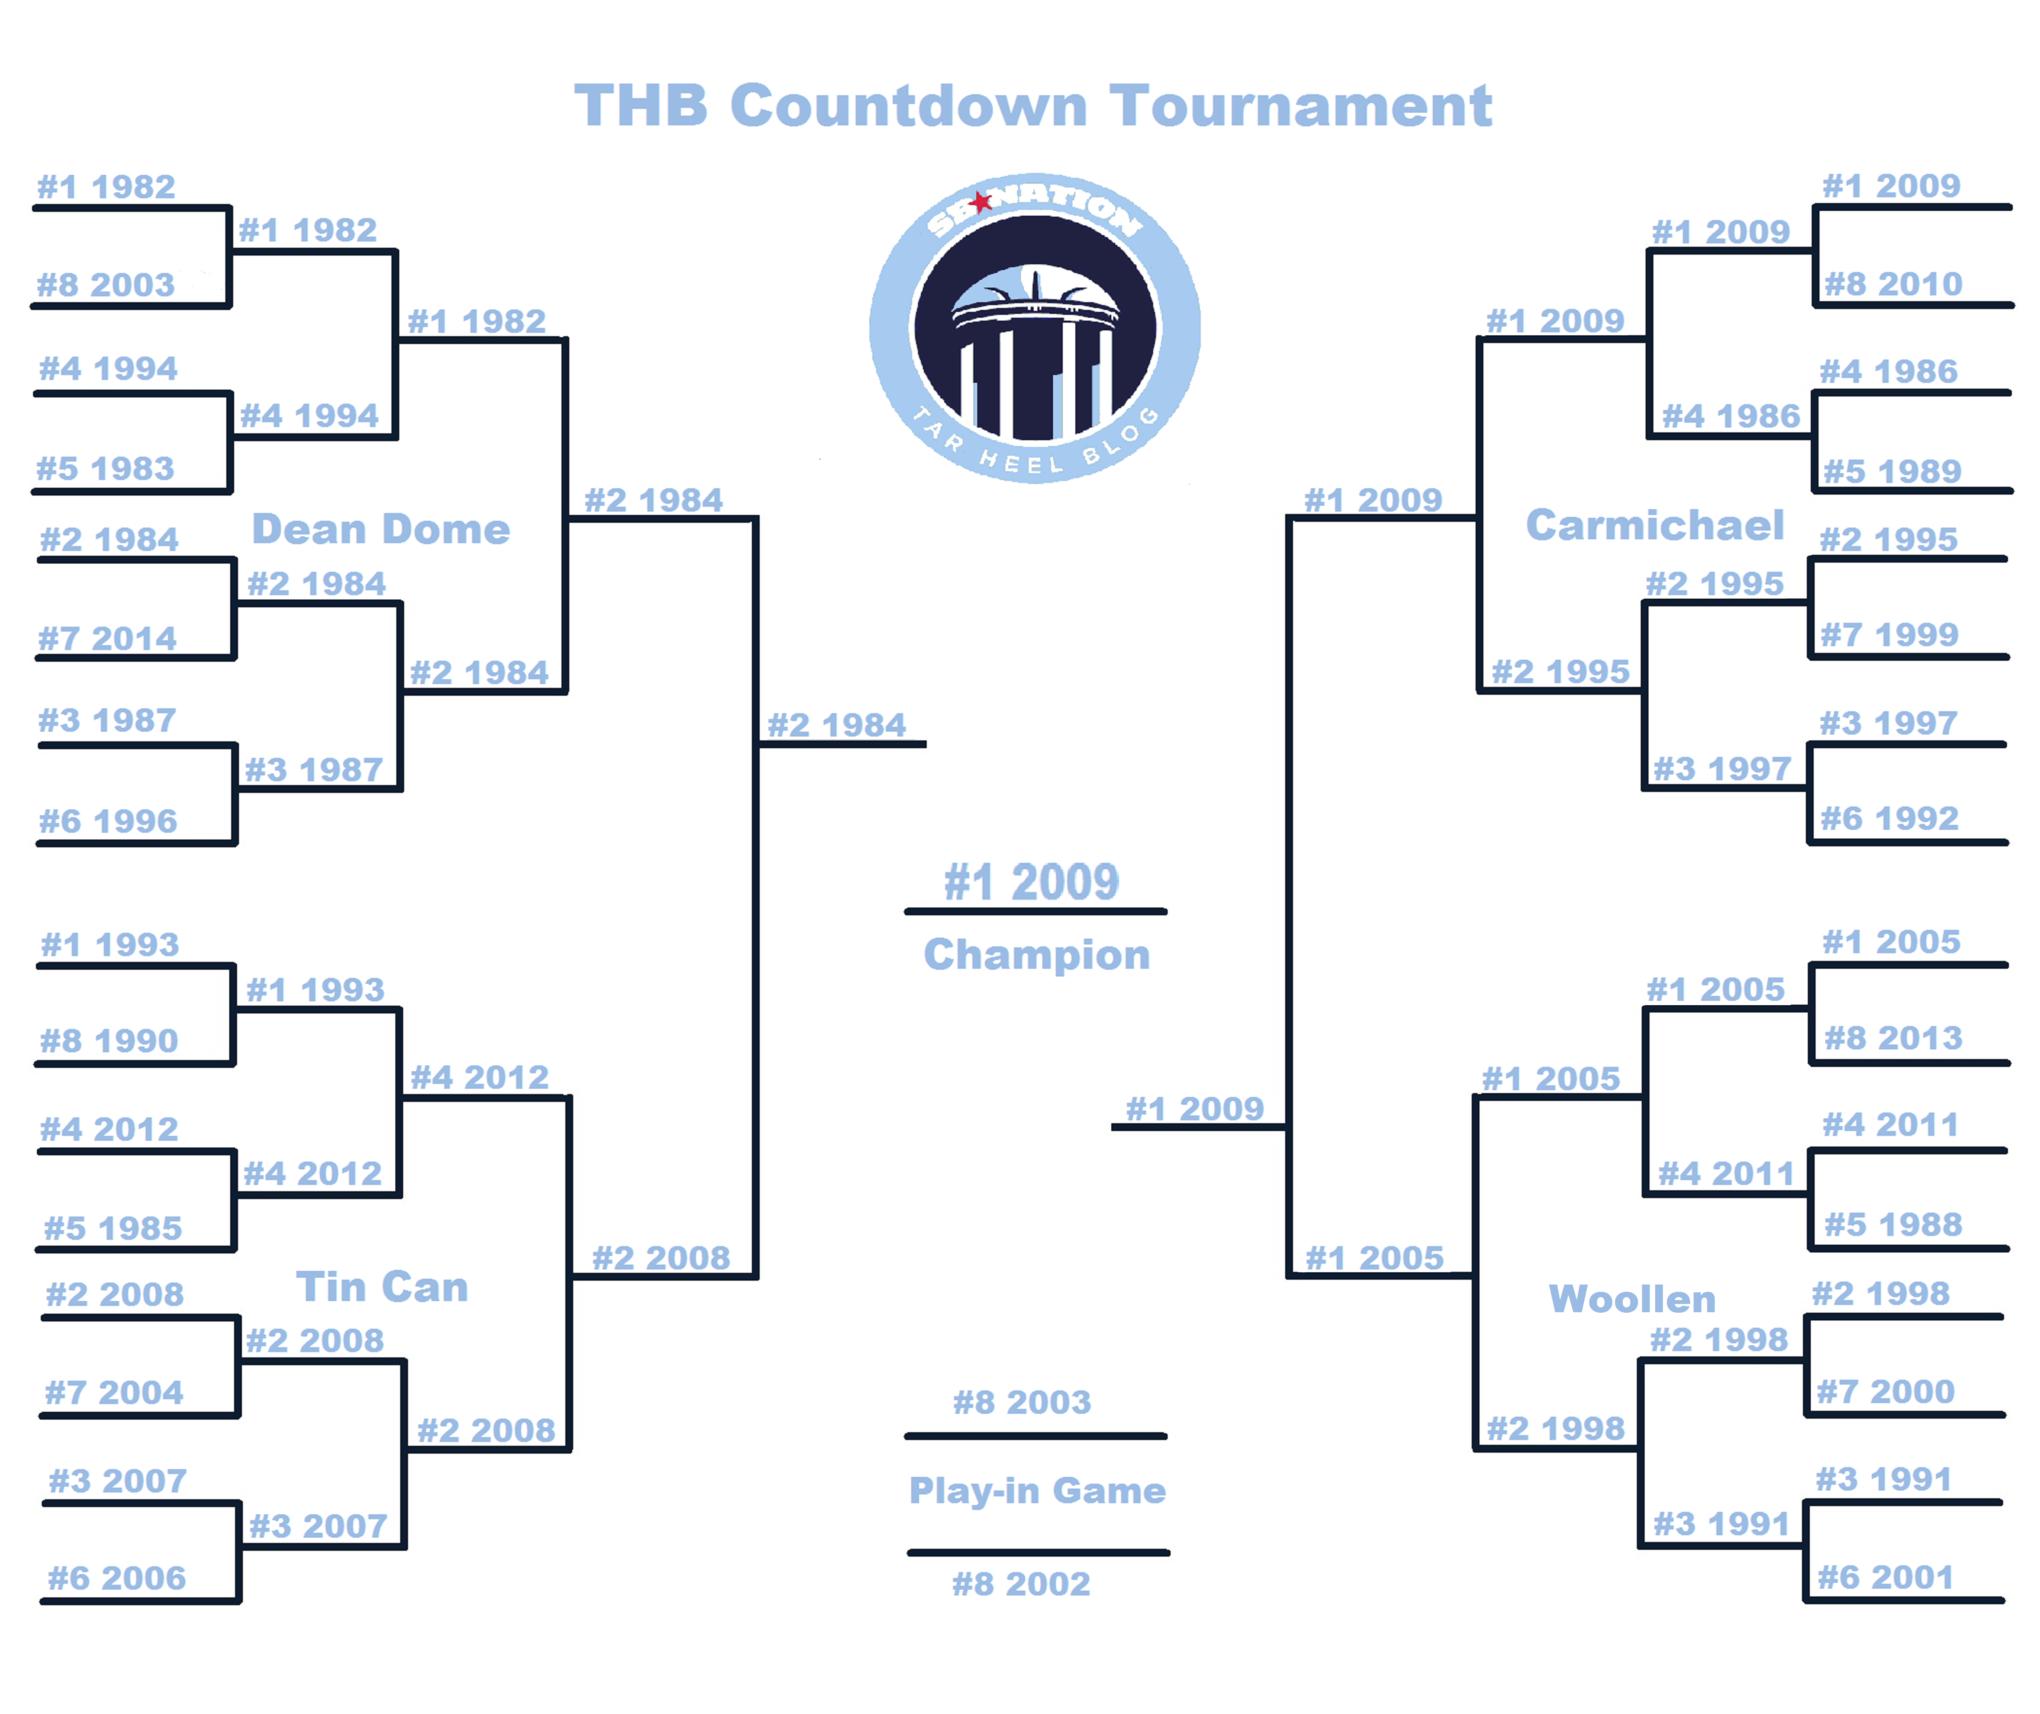 Thb_countdown_tournament-champion-2009_medium